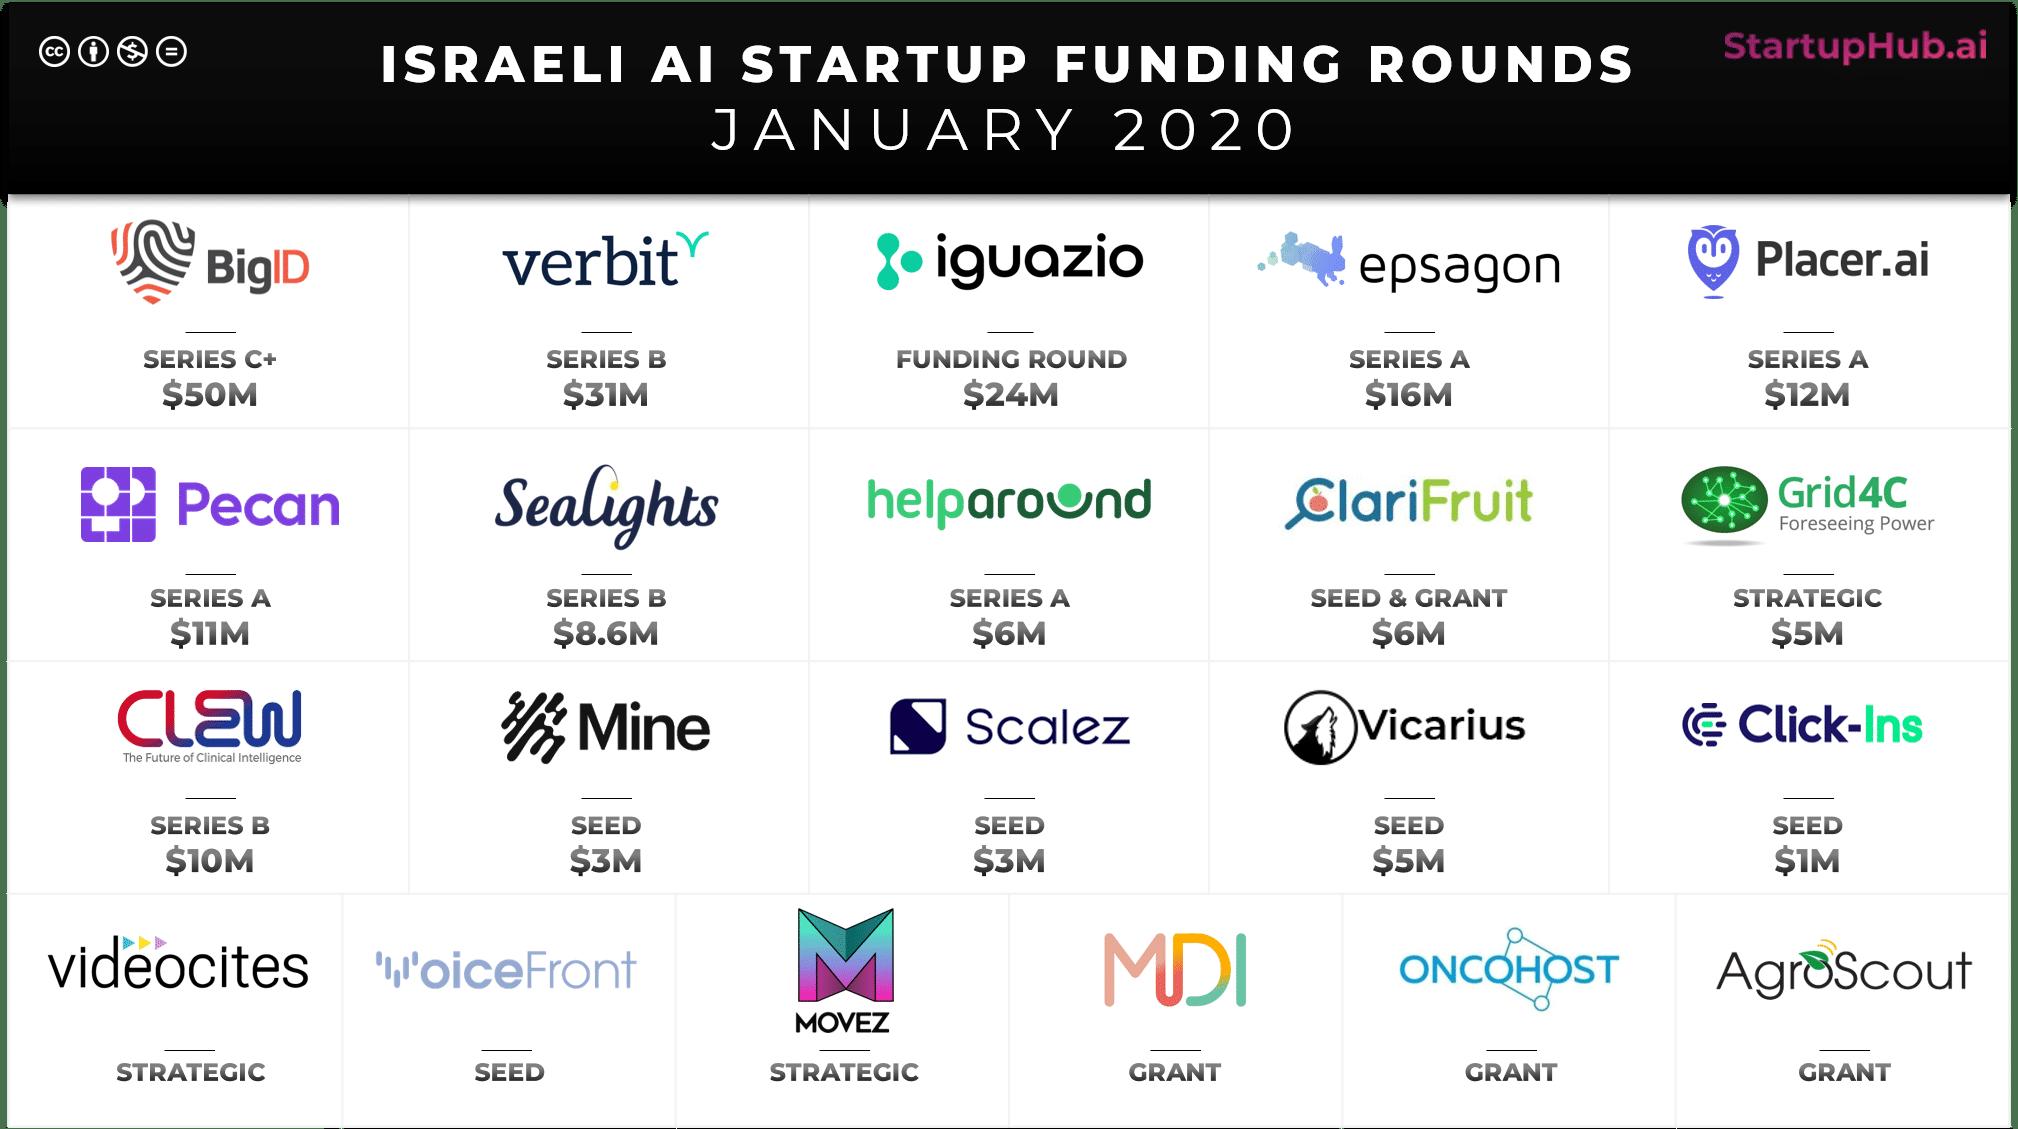 Israeli AI Startup Funding Rounds of January 2020